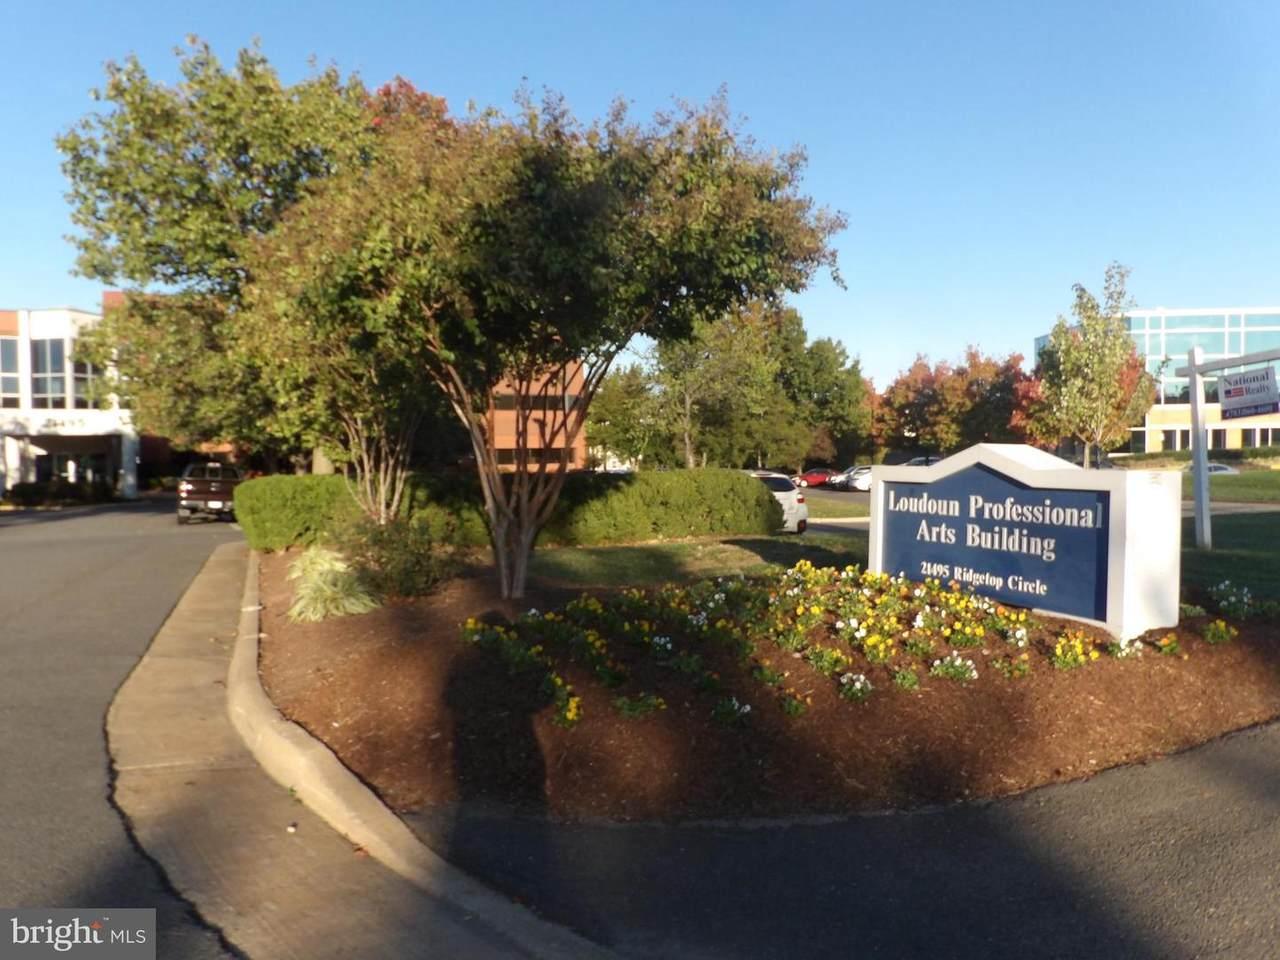 21495 Ridgetop Circle - Photo 1